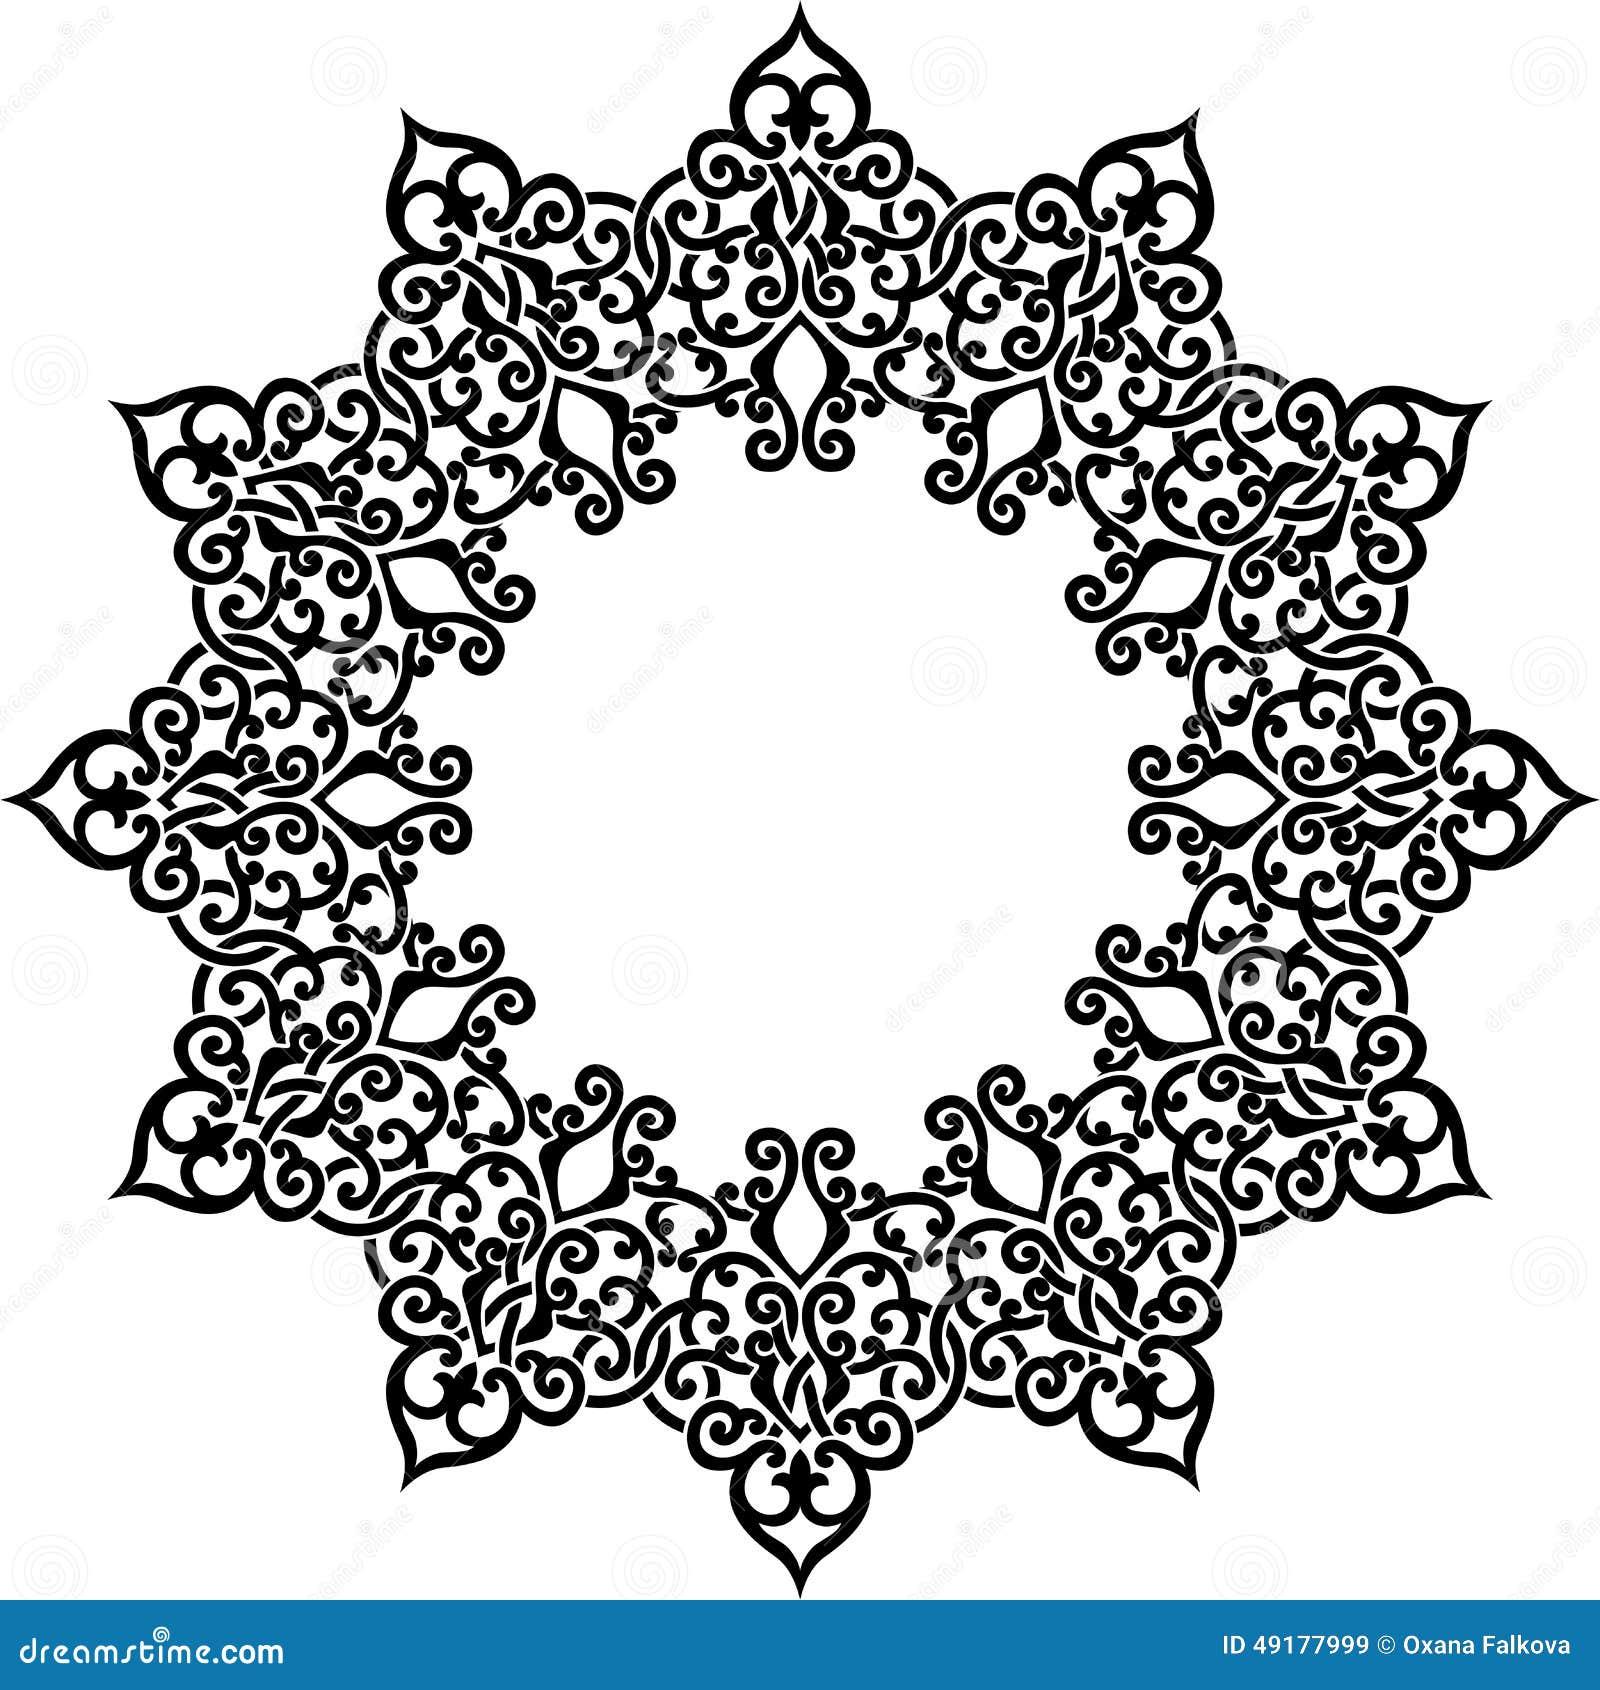 Vector illustration of circle ornamental frame. Stencil for decor.